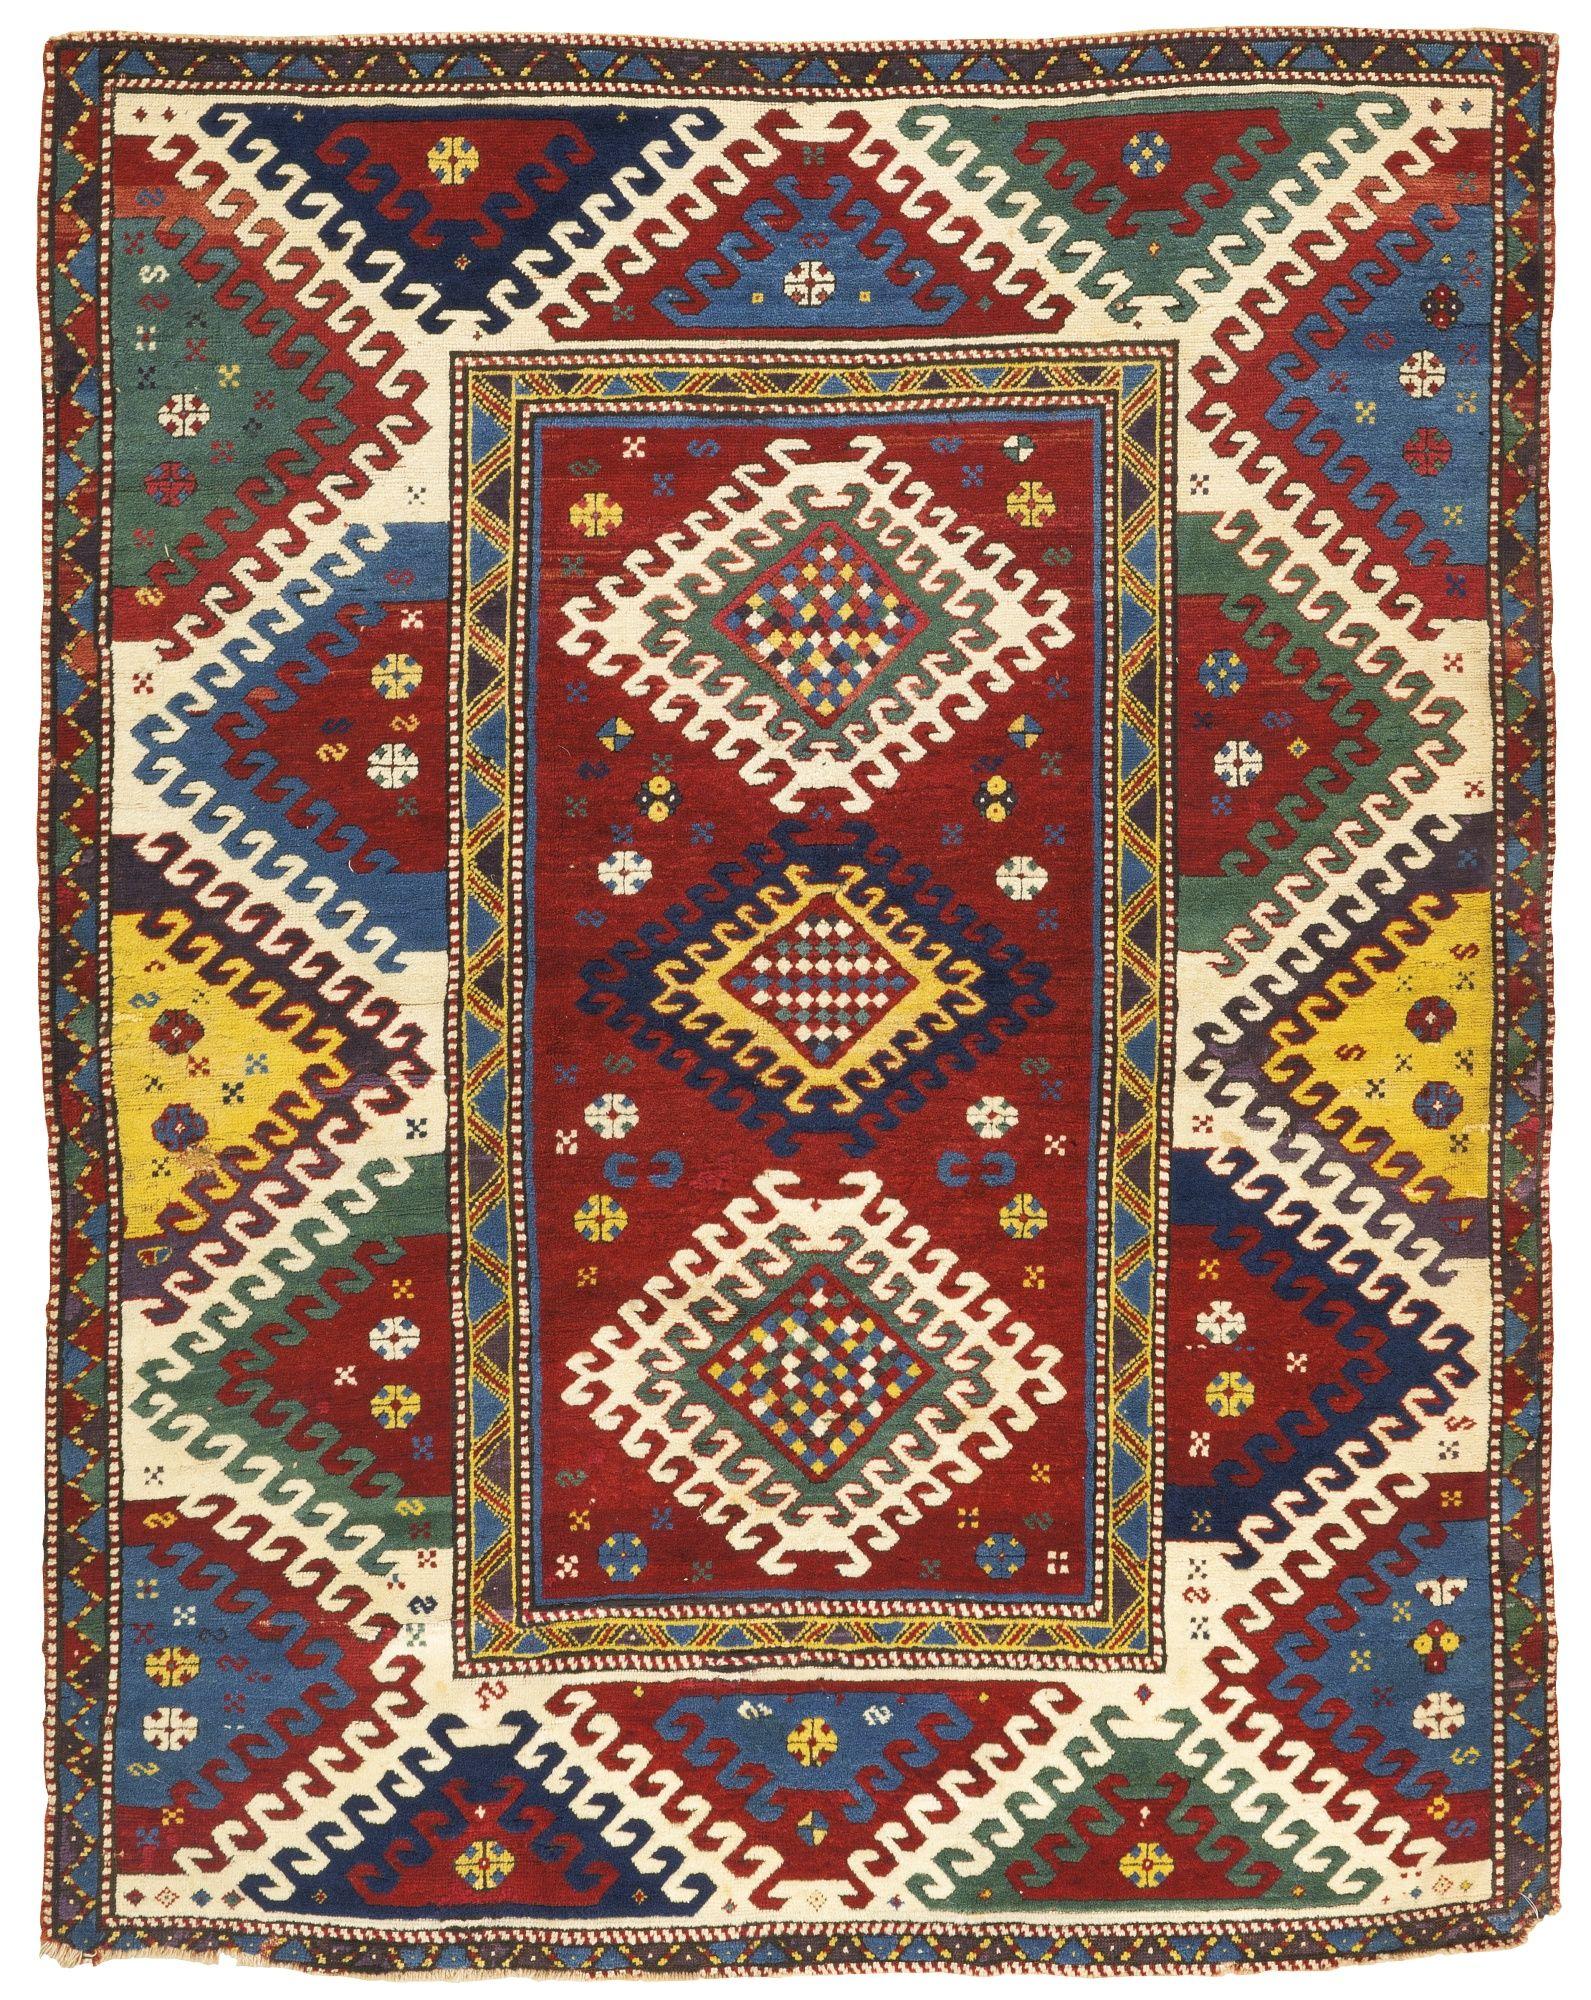 A Bordjalou Kazak rug, West Caucasus | lot | Sotheby's